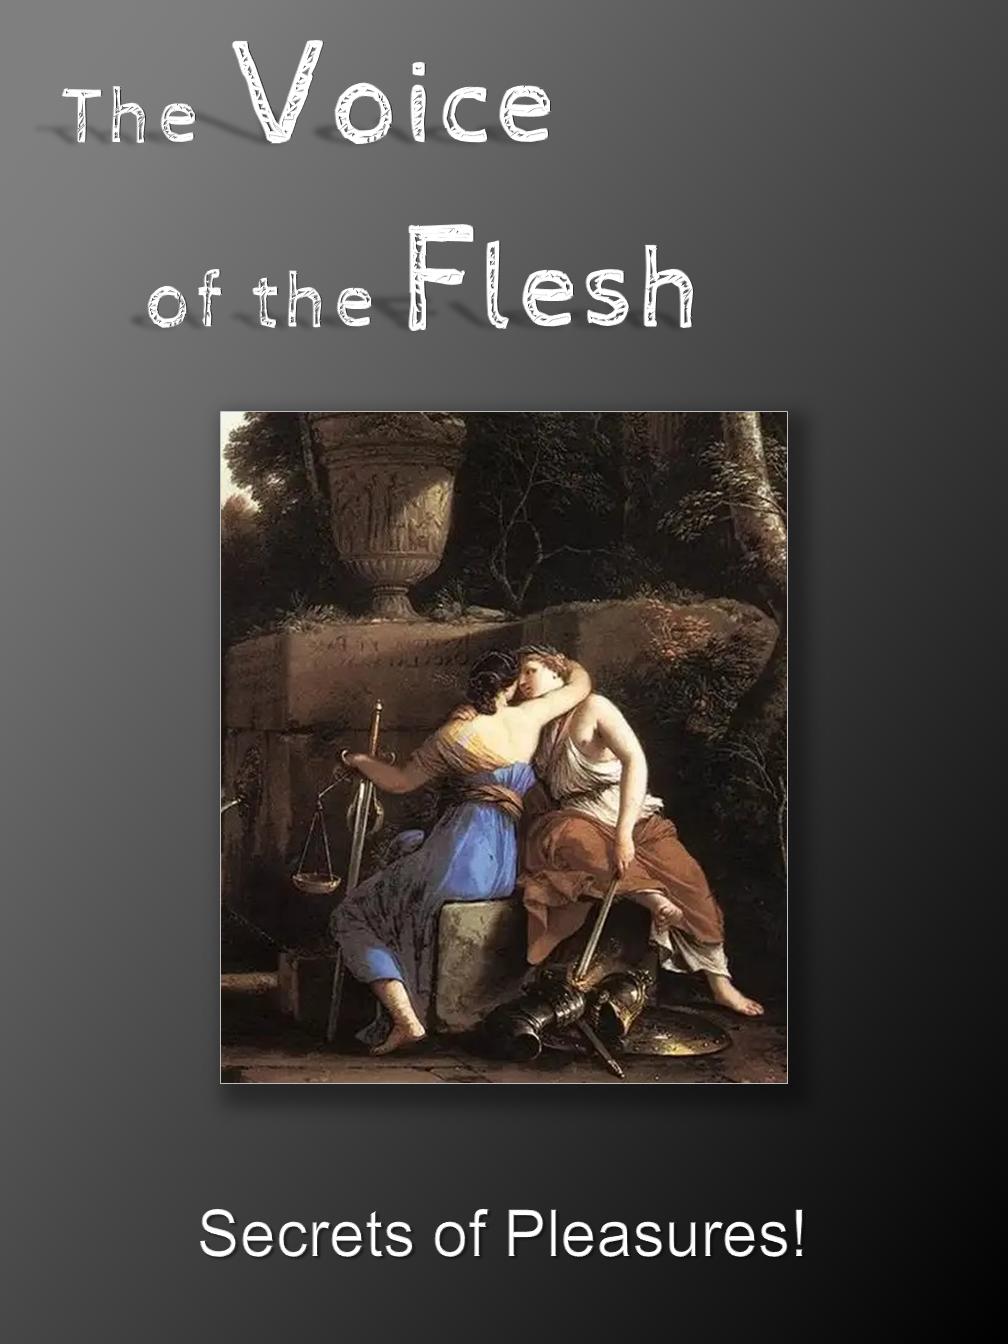 Voice of Flesh